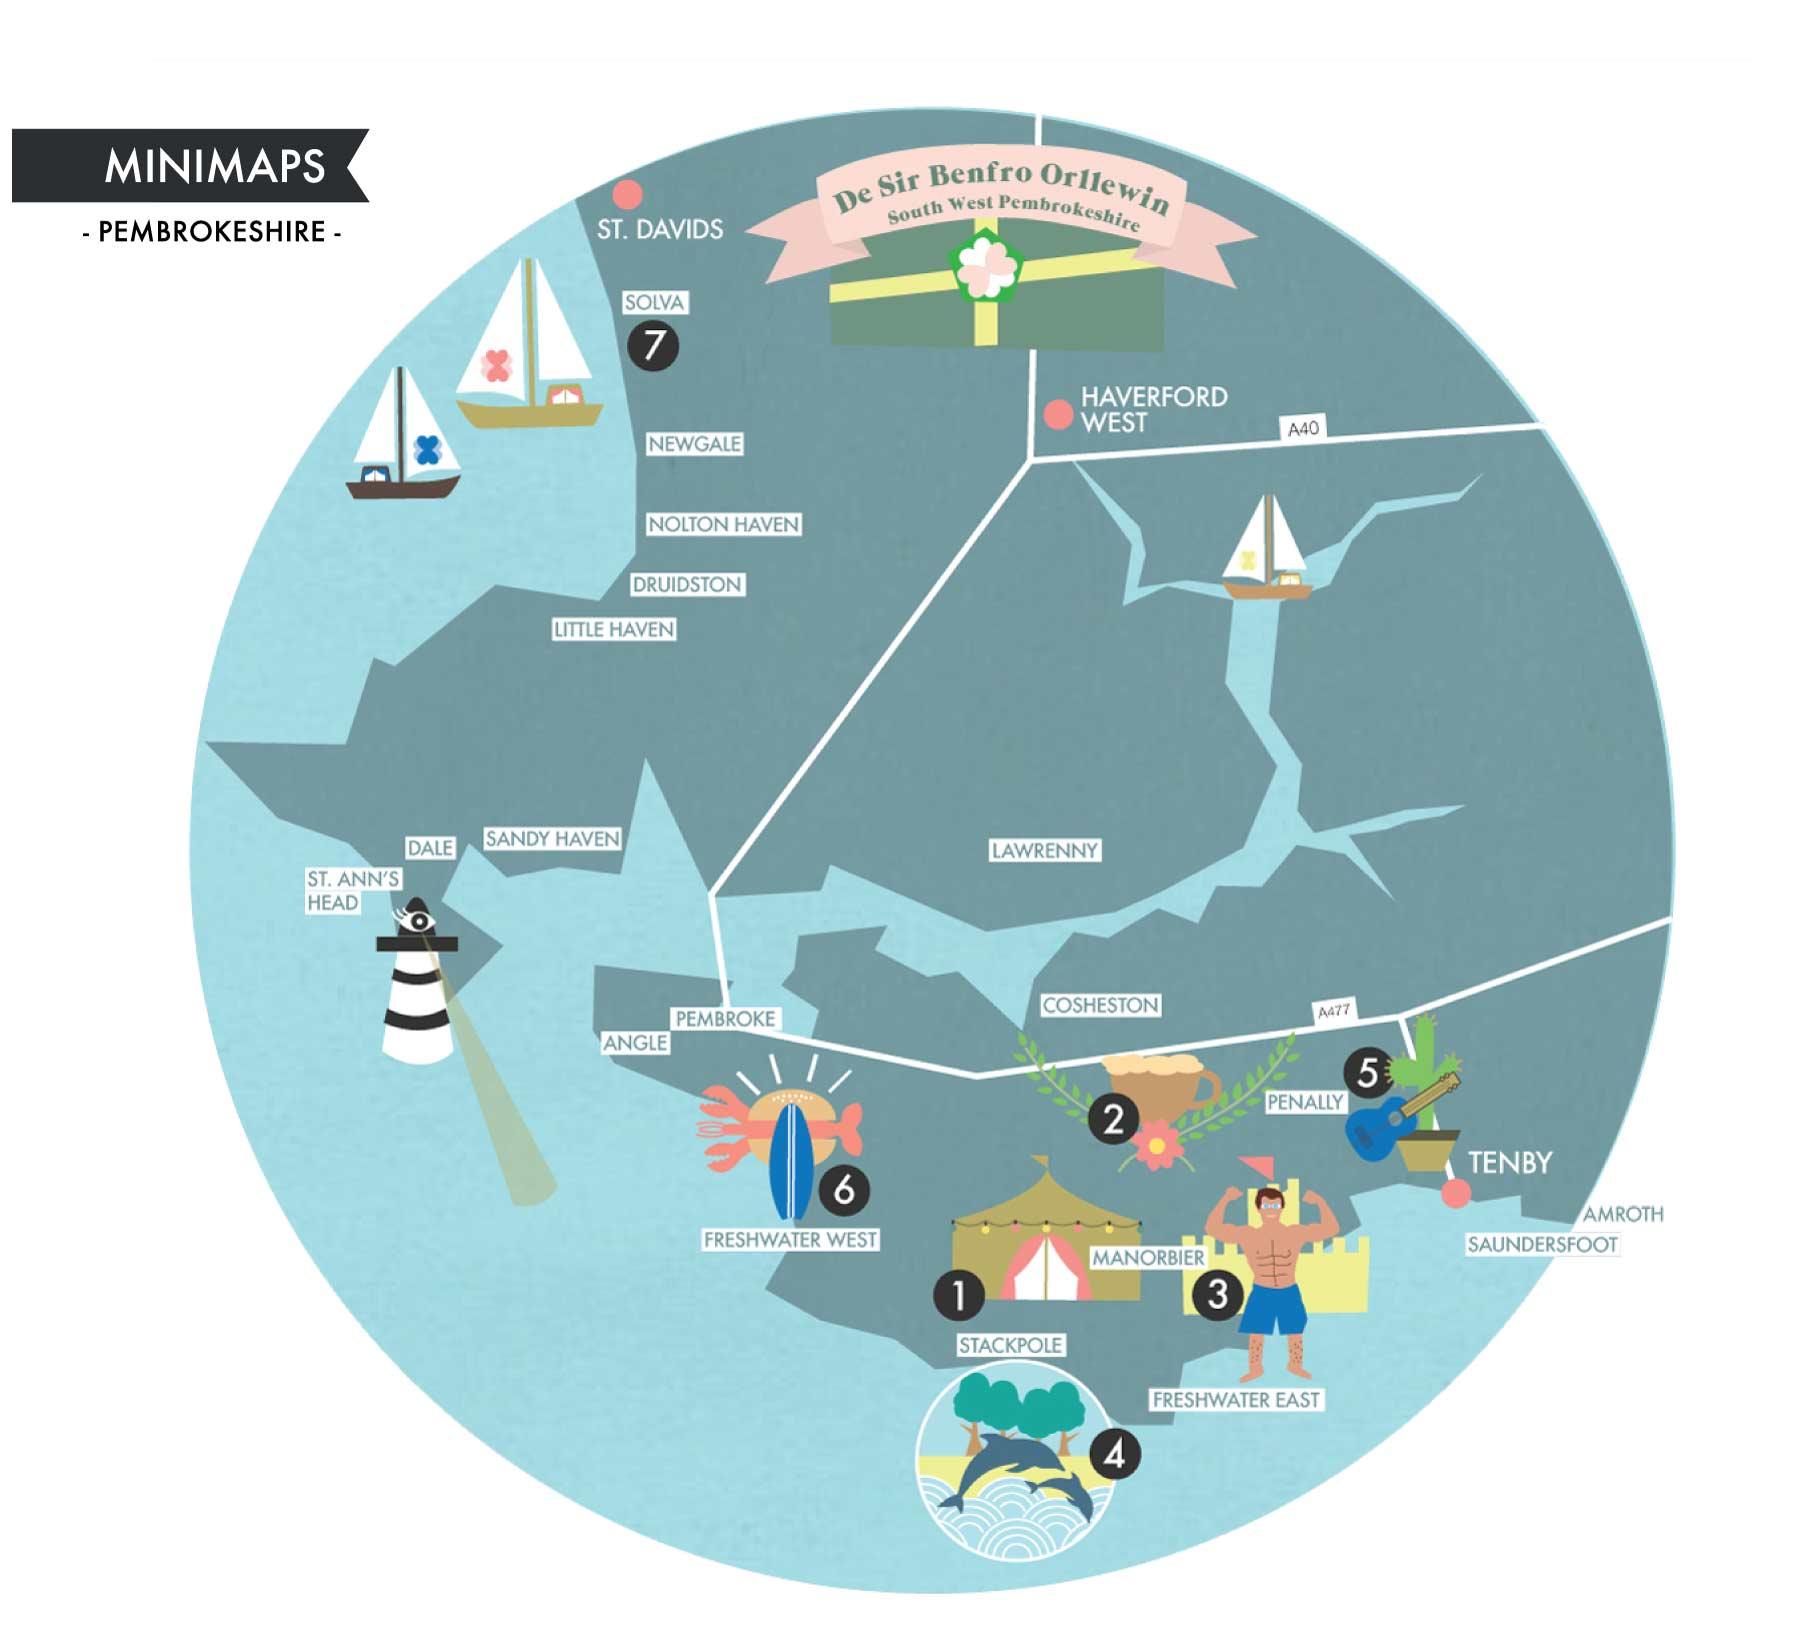 Pembrokeshire-Minimap_POST